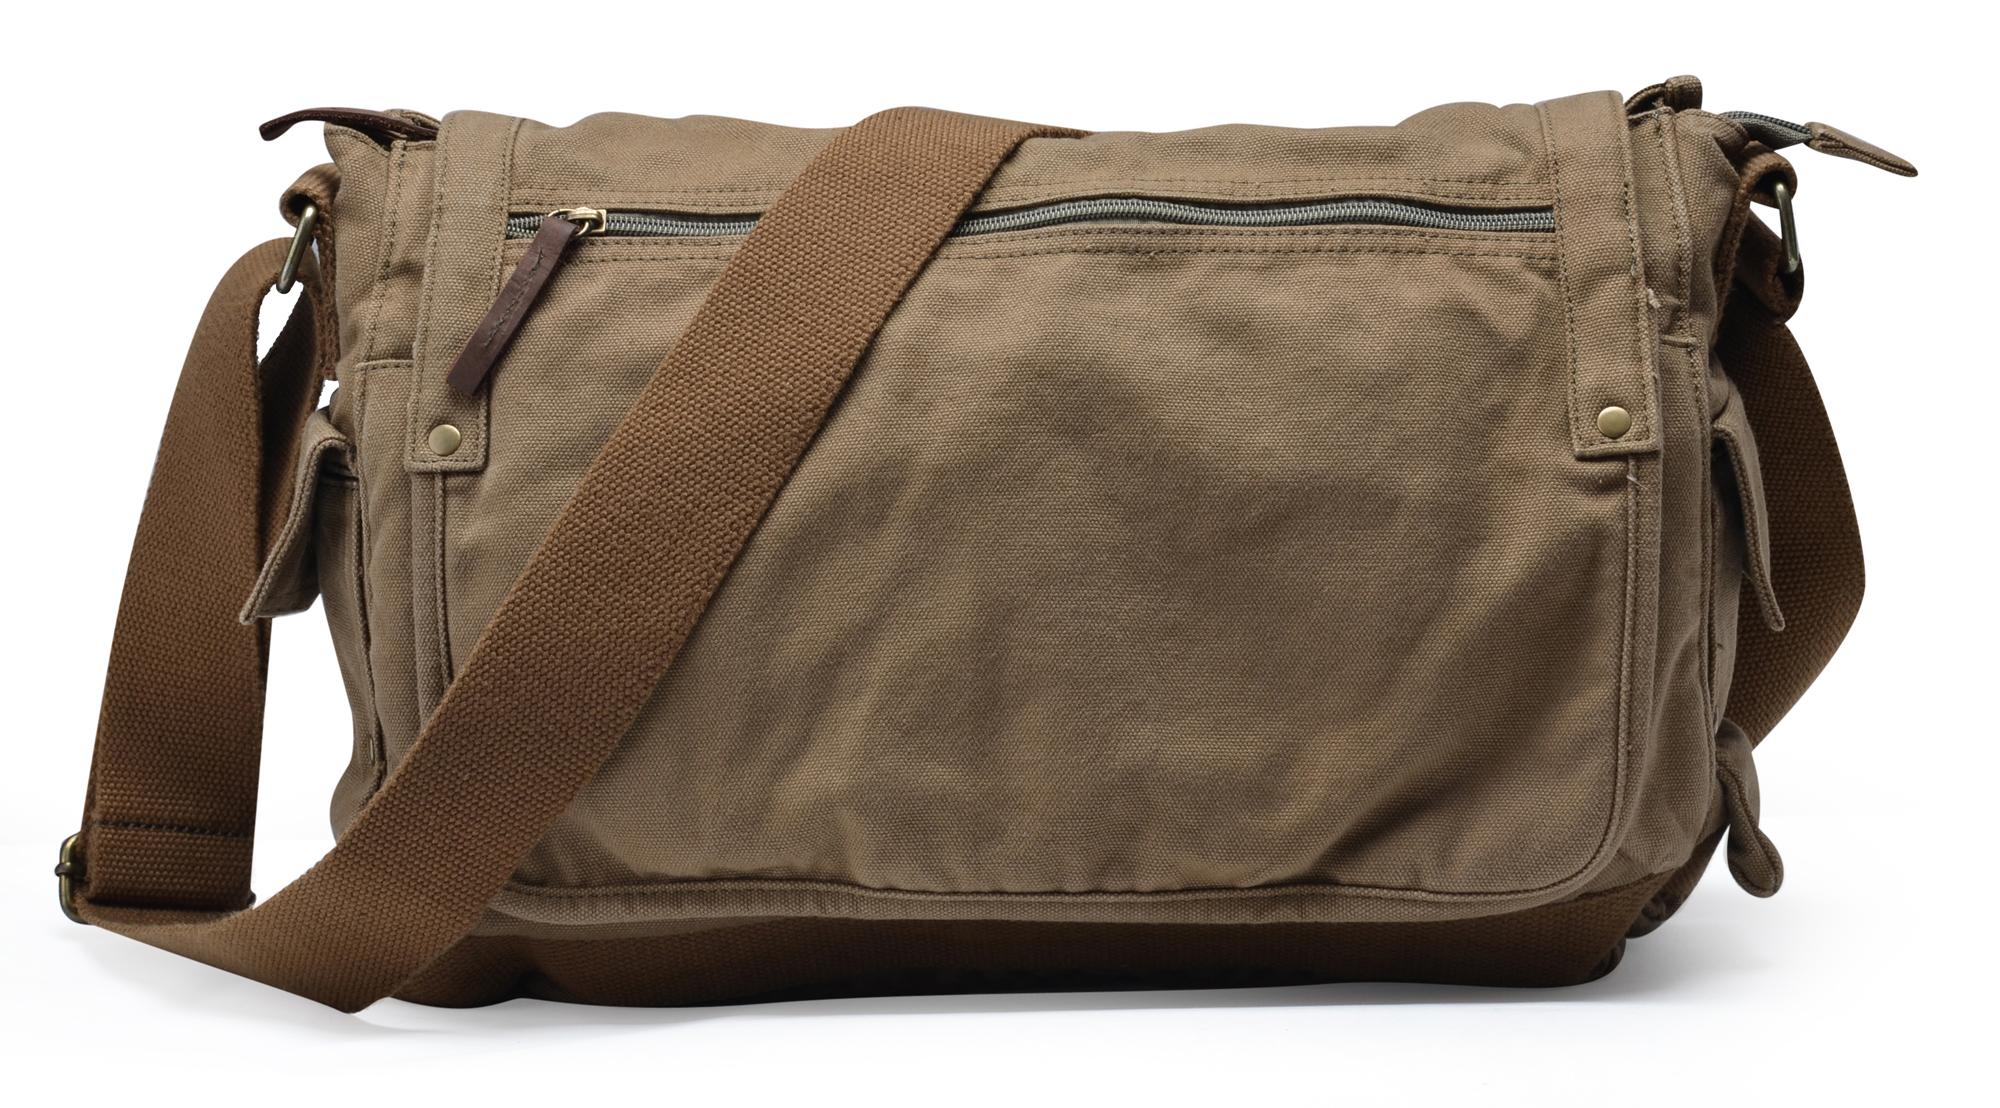 Gootium Vintage Canvas Messenger Bag Classic Cross-body Shoulder Bag ... a32188eb829